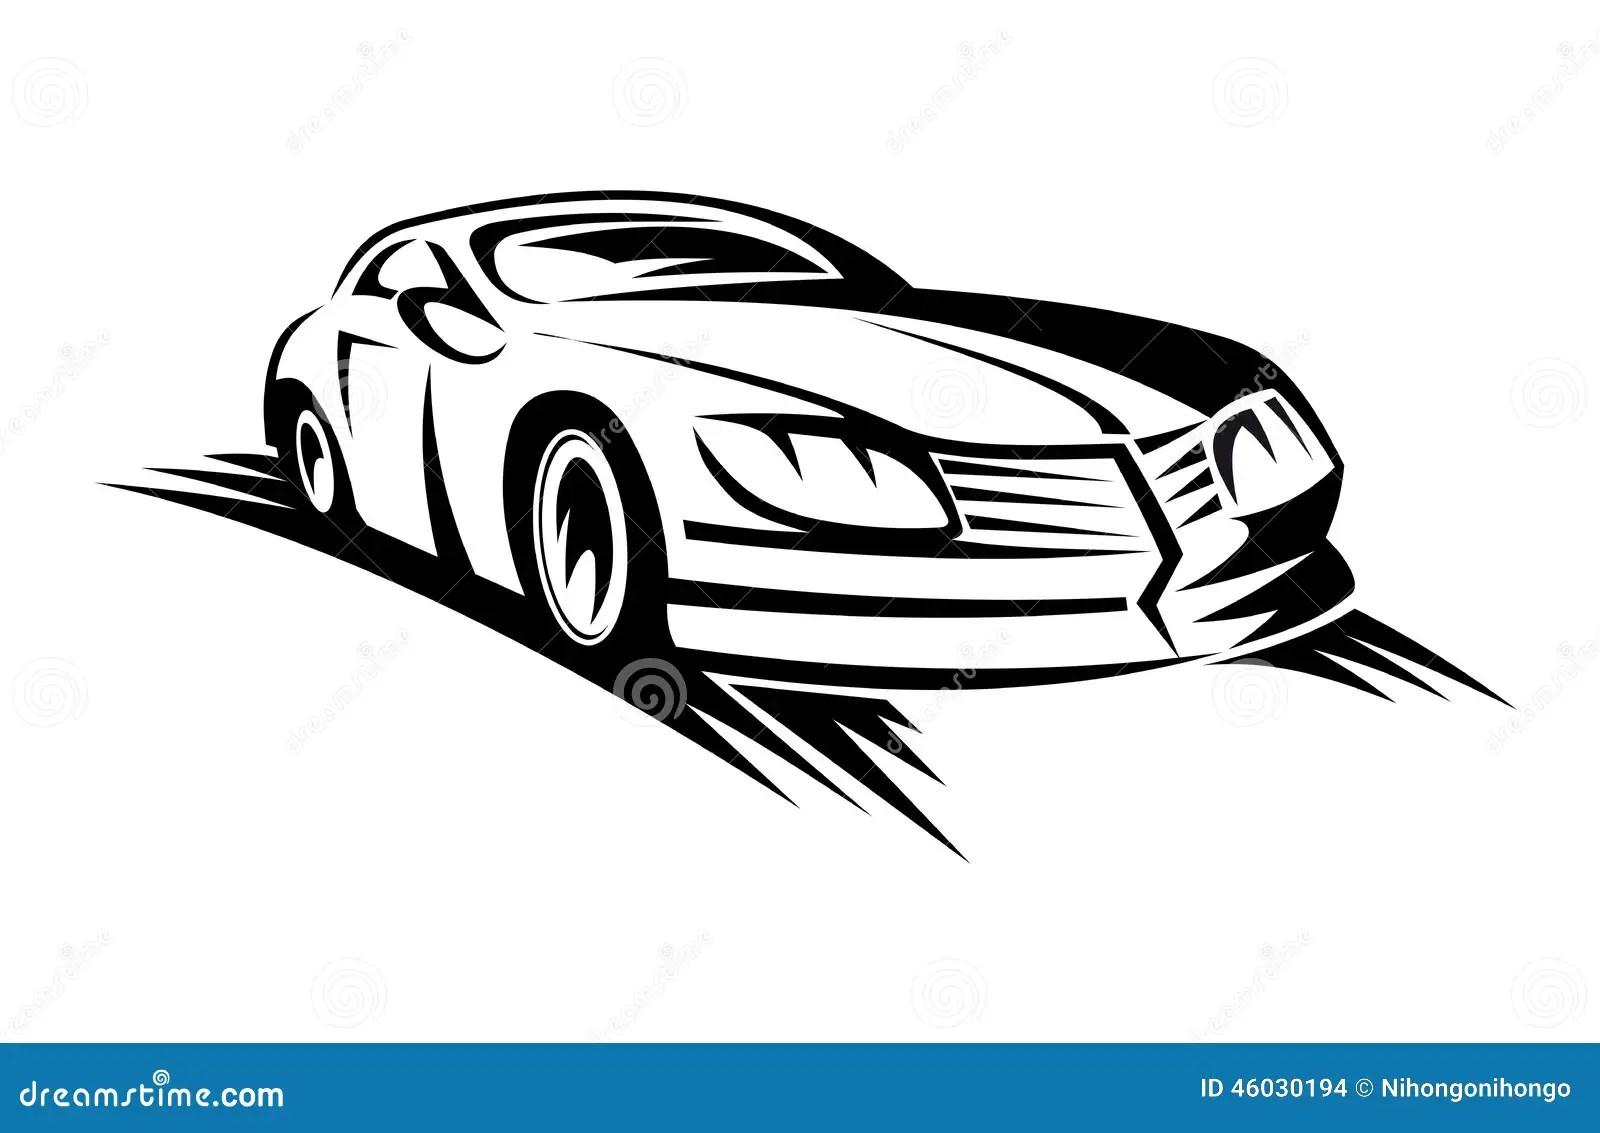 Car Driving Away